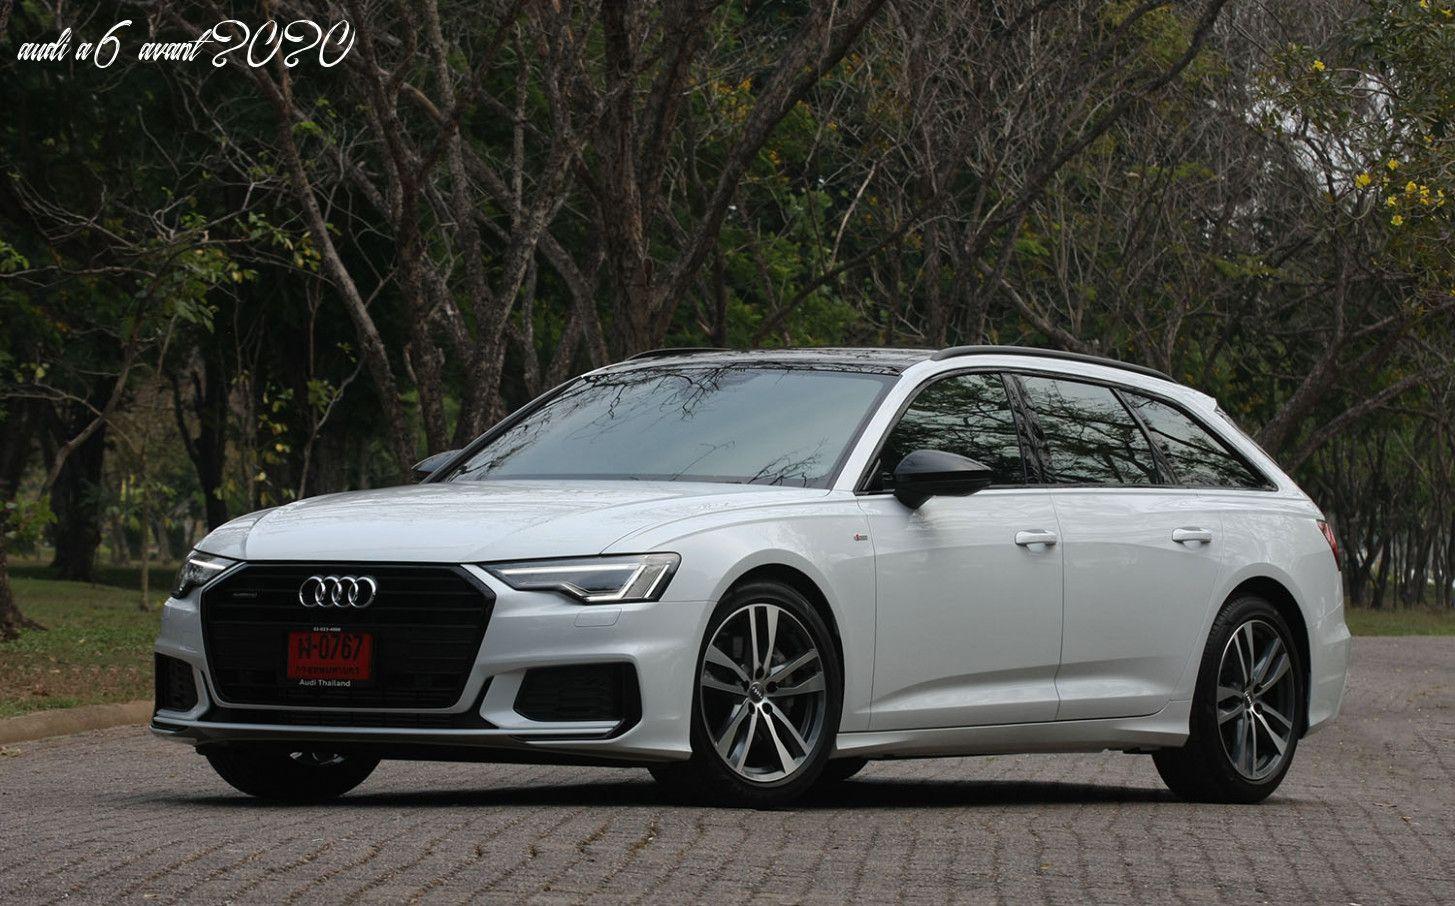 Audi A6 Avant 2020 In 2020 Audi A6 Avant A6 Avant Audi A6